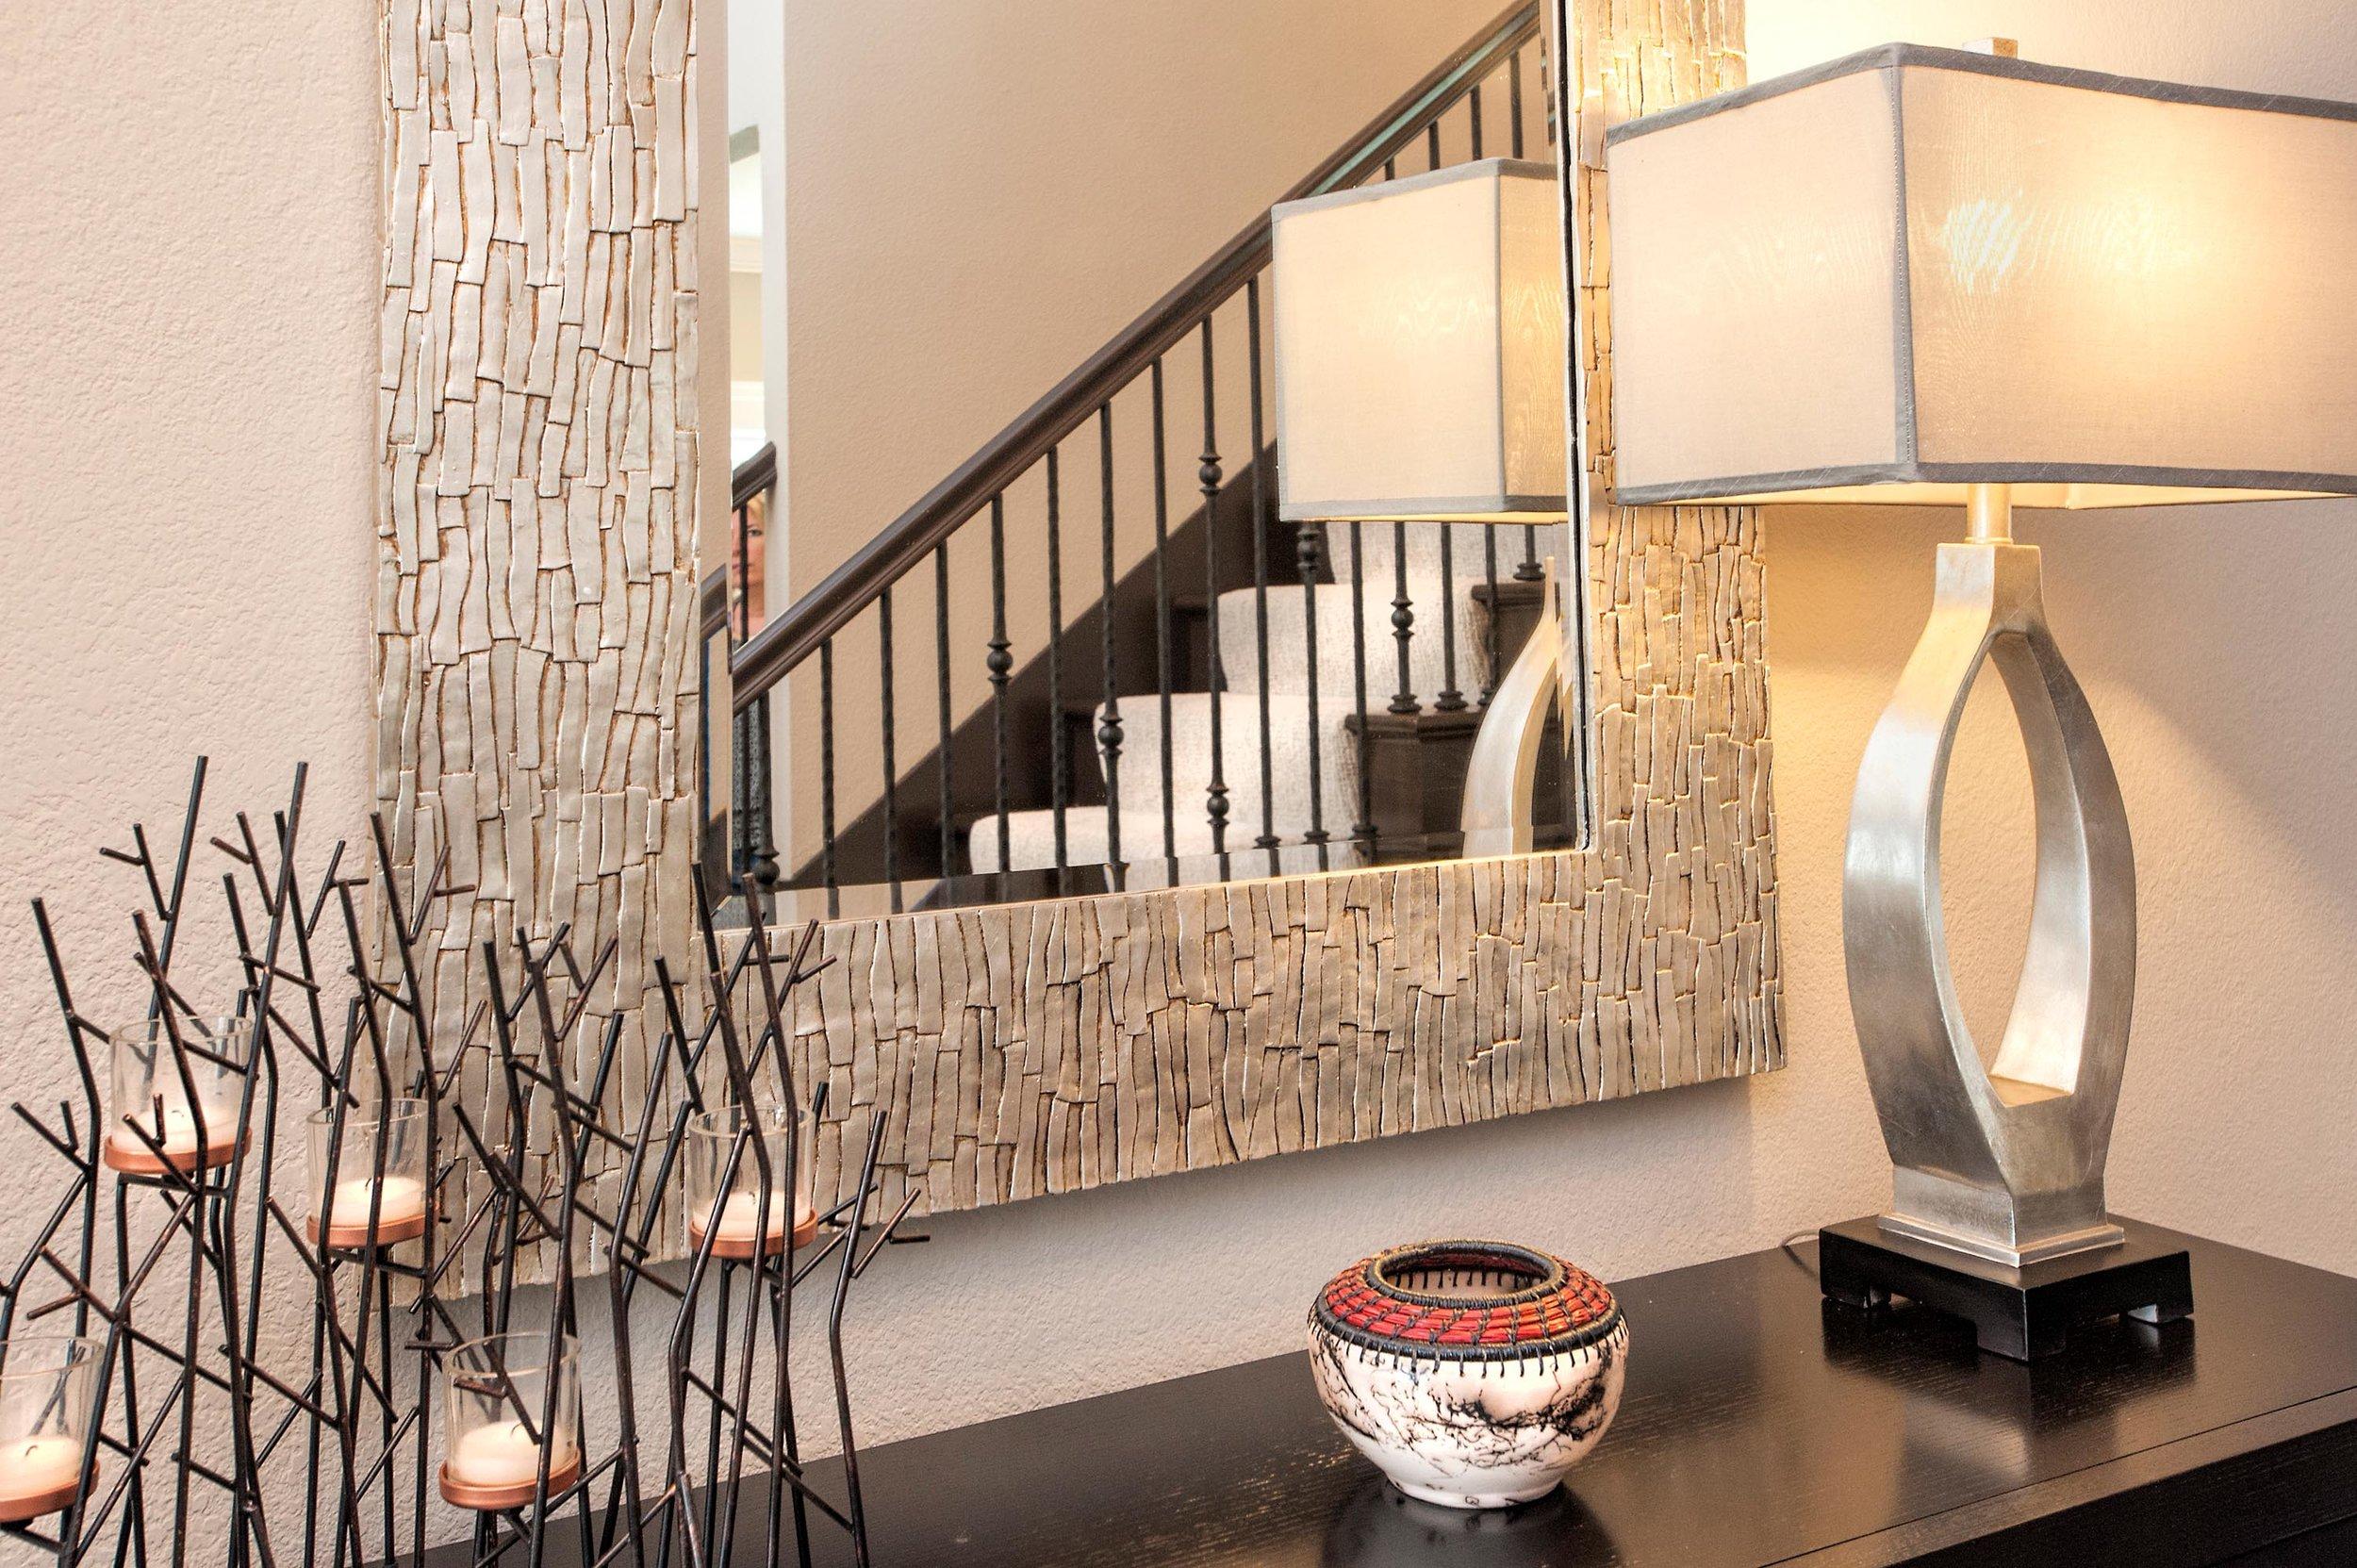 Stylish Lamp and mirror